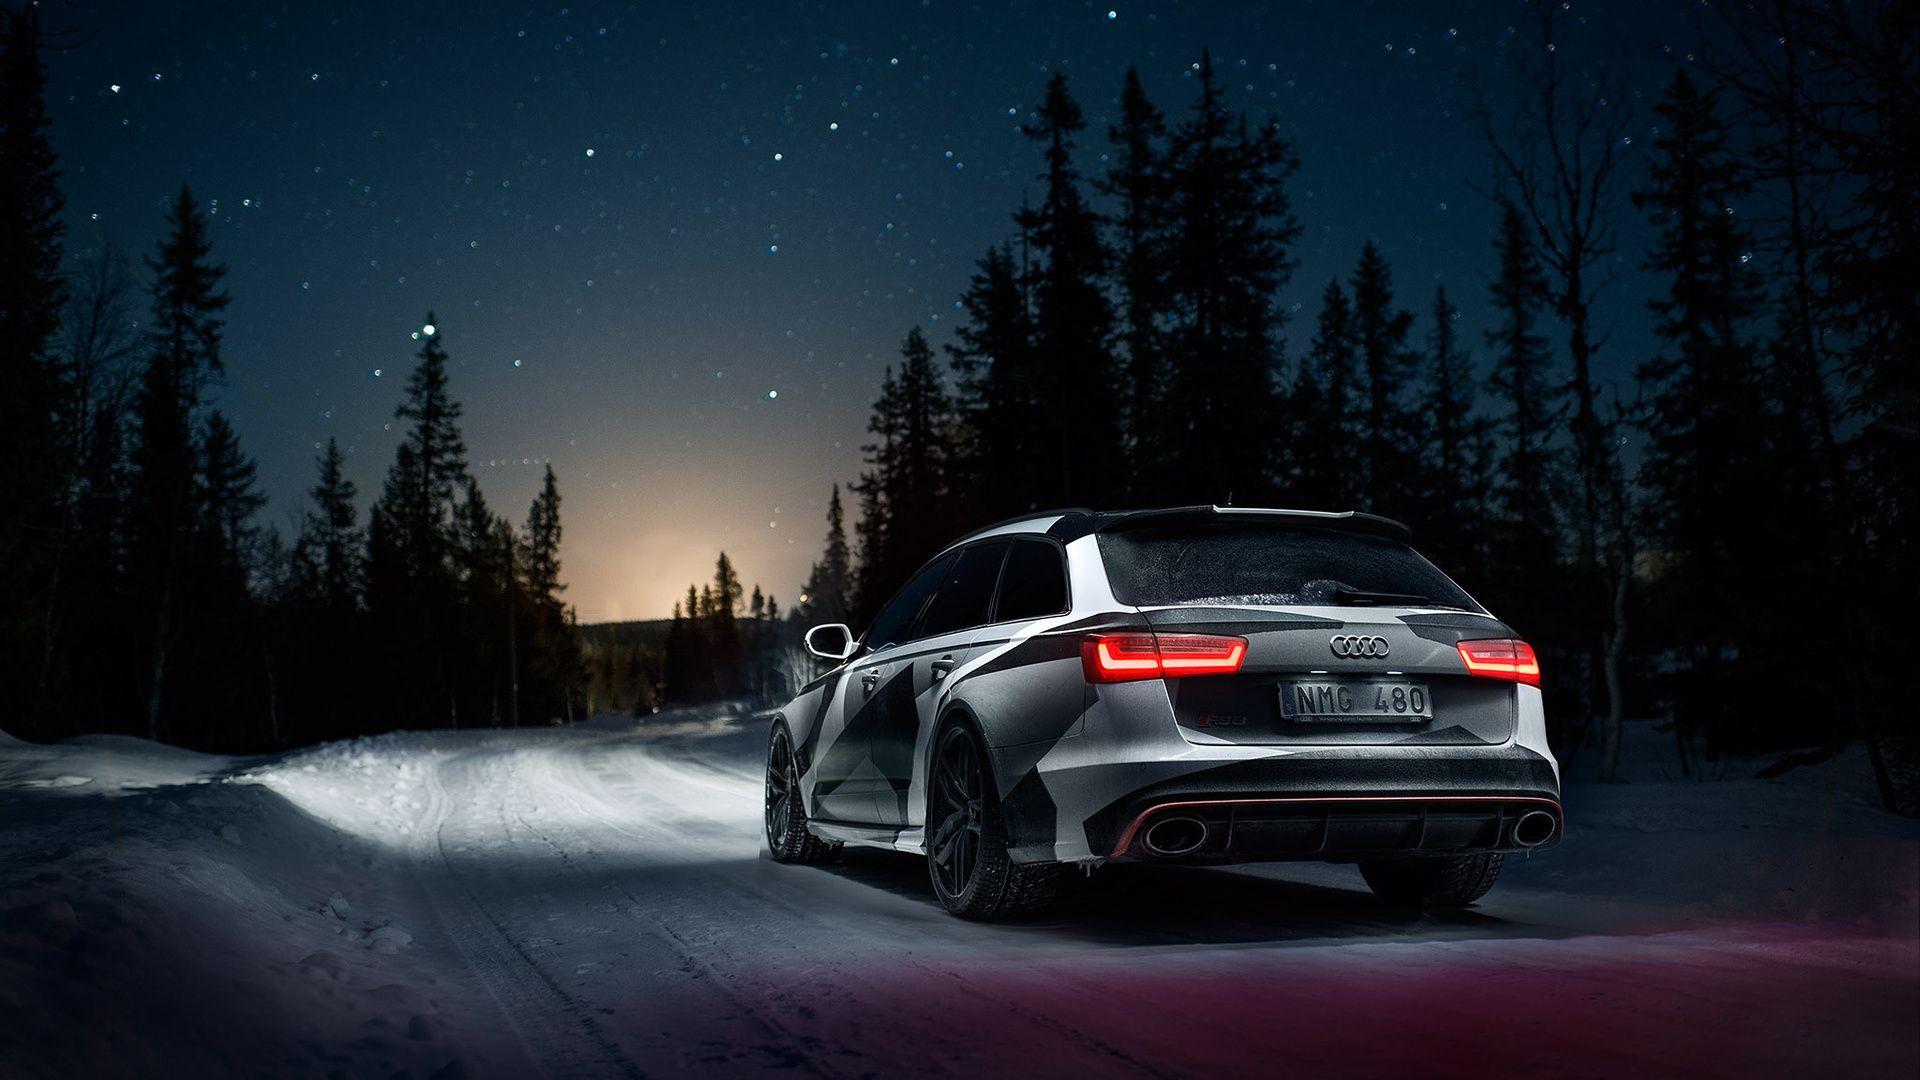 Audi Rs6 Audi Rs6 Audi Rs6 Wagon Audi Rs